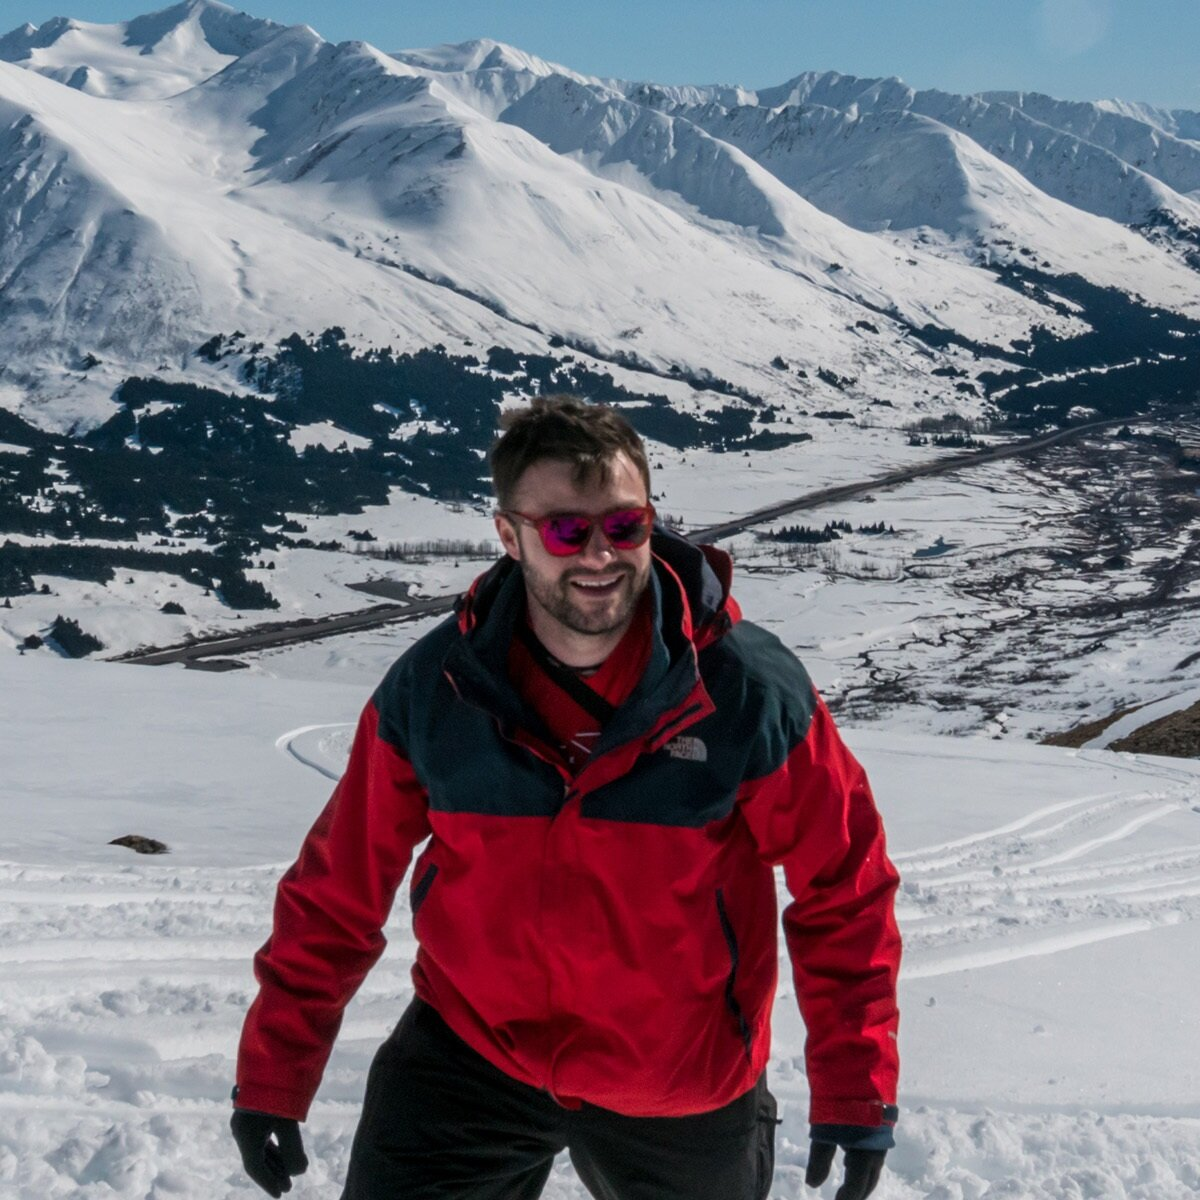 dan-redfield-alaska-photoventures-adventure-photographer-anchorage-based-12.jpg